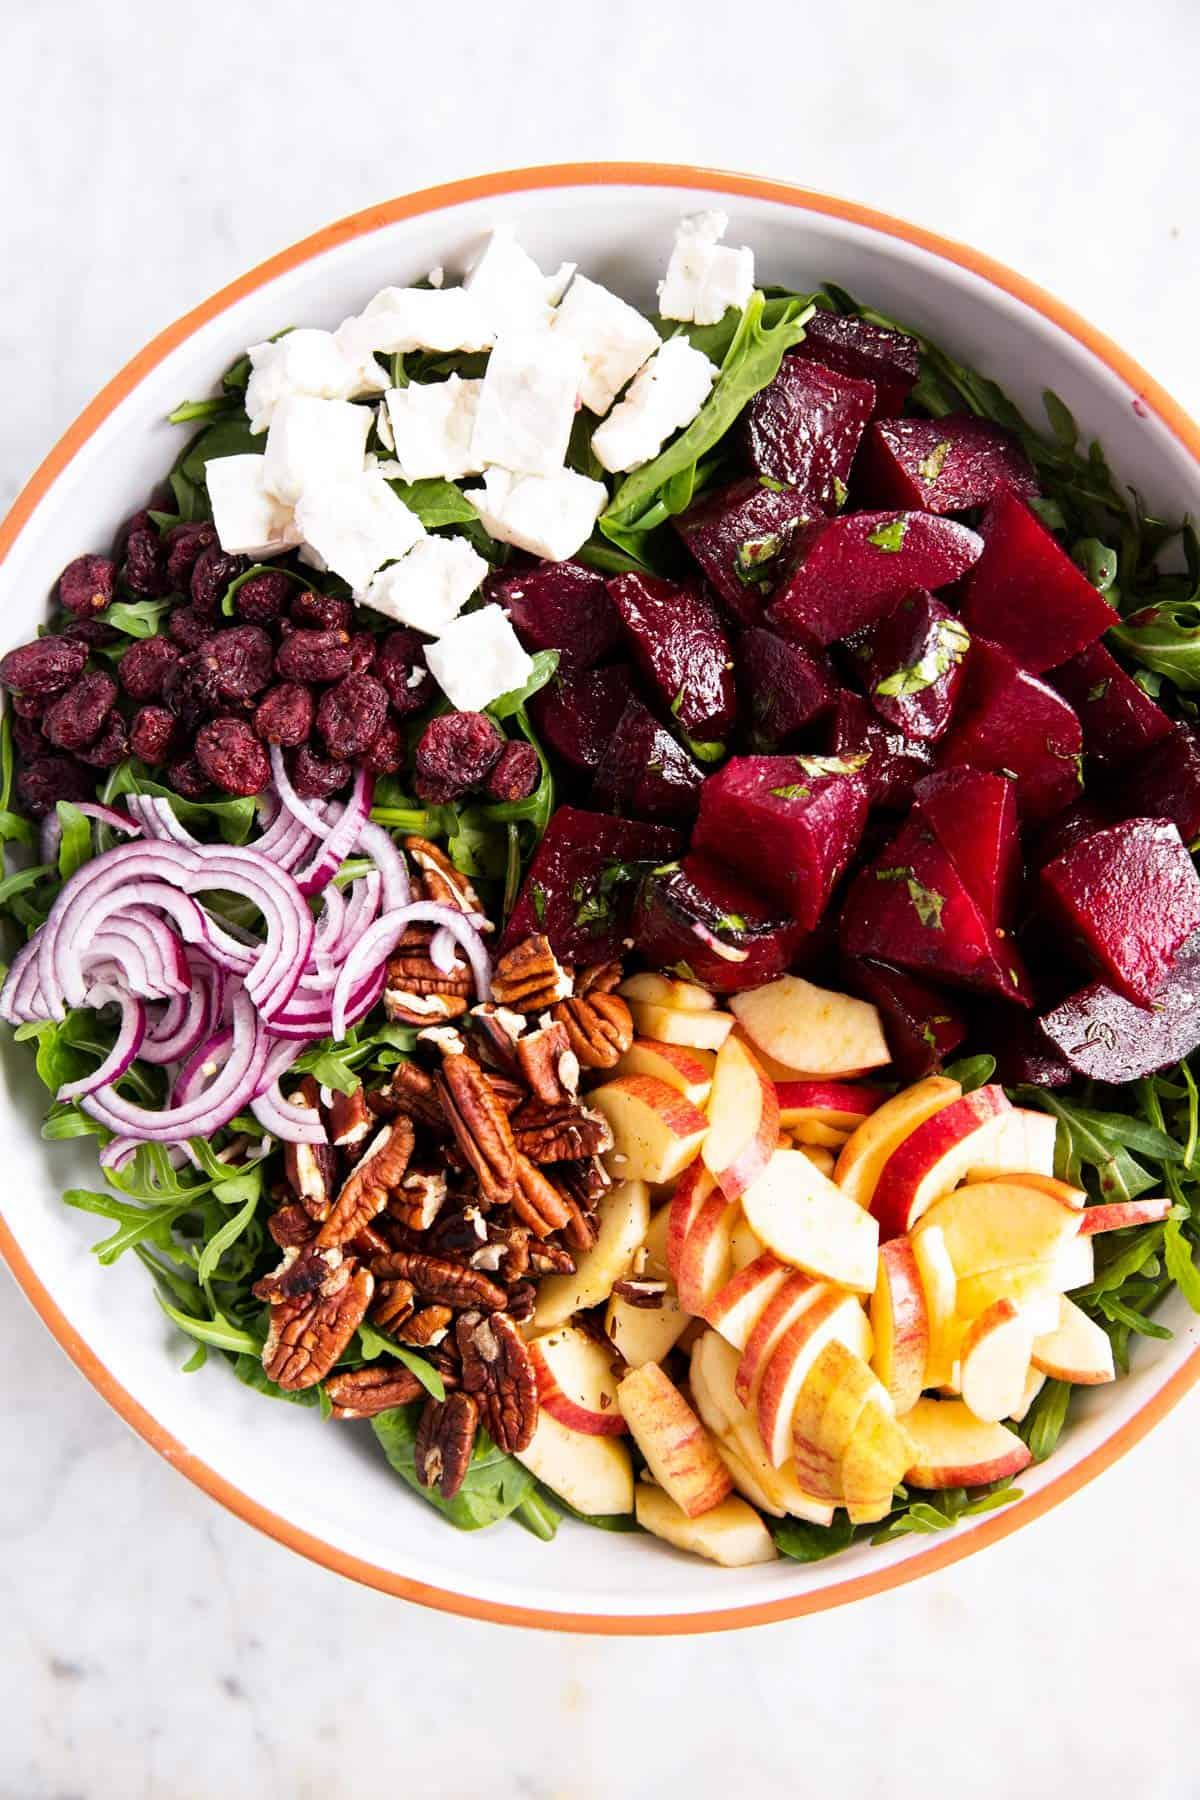 salad bowl with beet salad ingredients